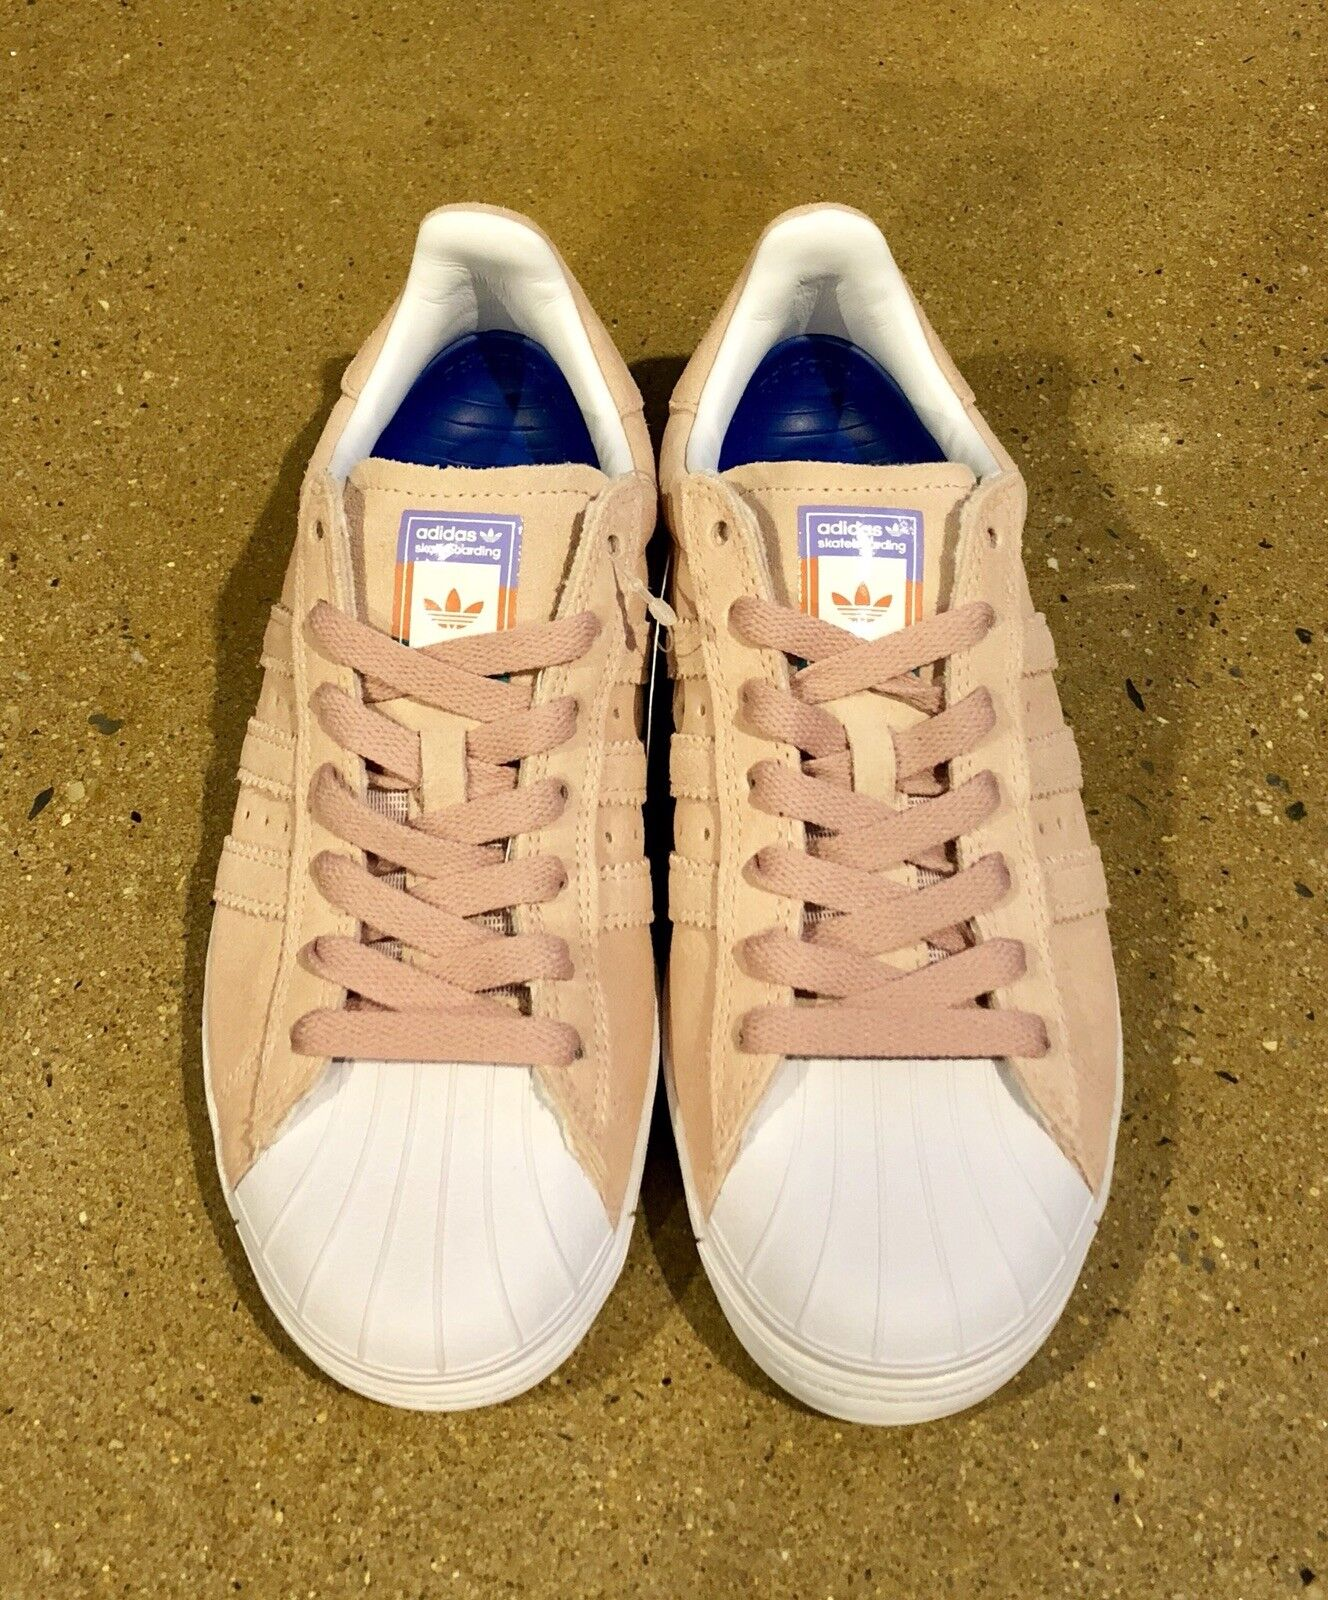 0784f080487e4 ... Adidas Skateboarding Superstar Vulc ADV Pastel Pink Size 4 4 4 Uomo s  Skate Shoes bb3529 ...